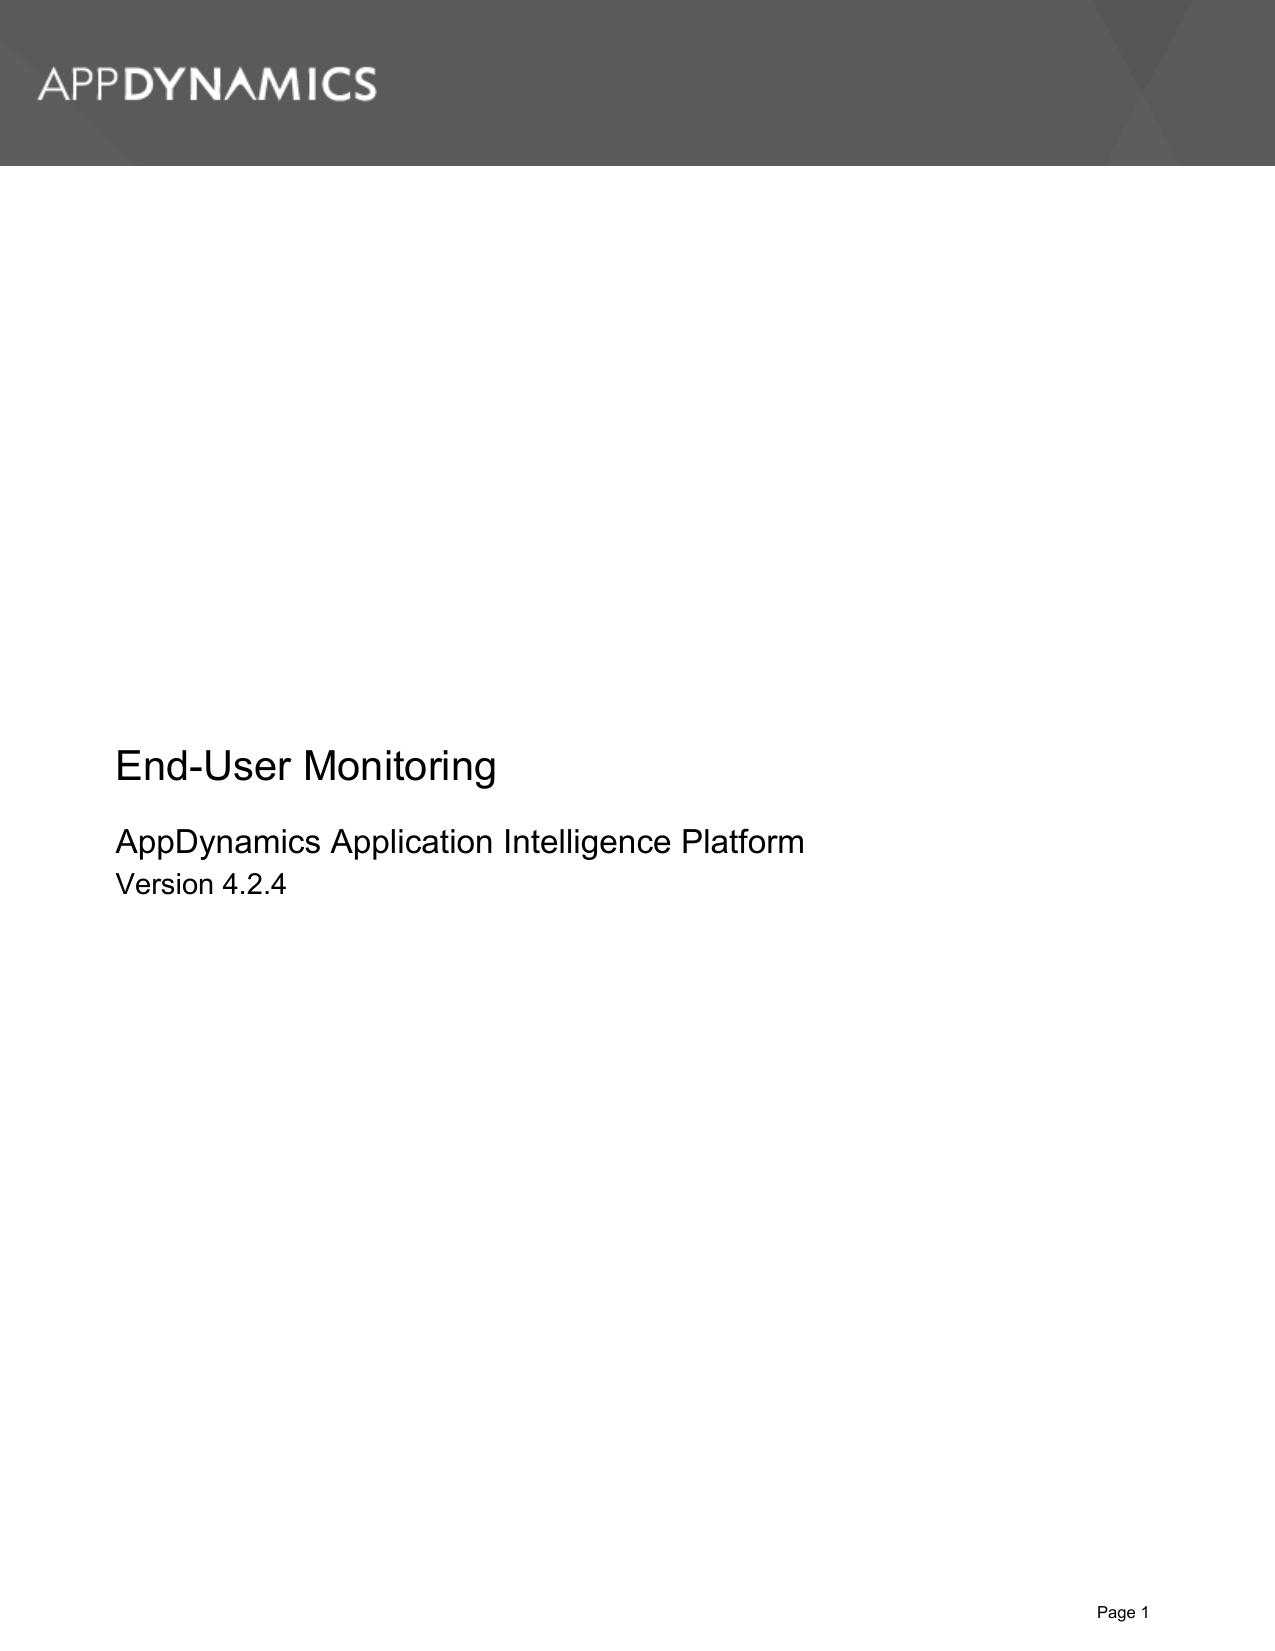 End-User Monitoring - AppDynamics Documentation | manualzz com